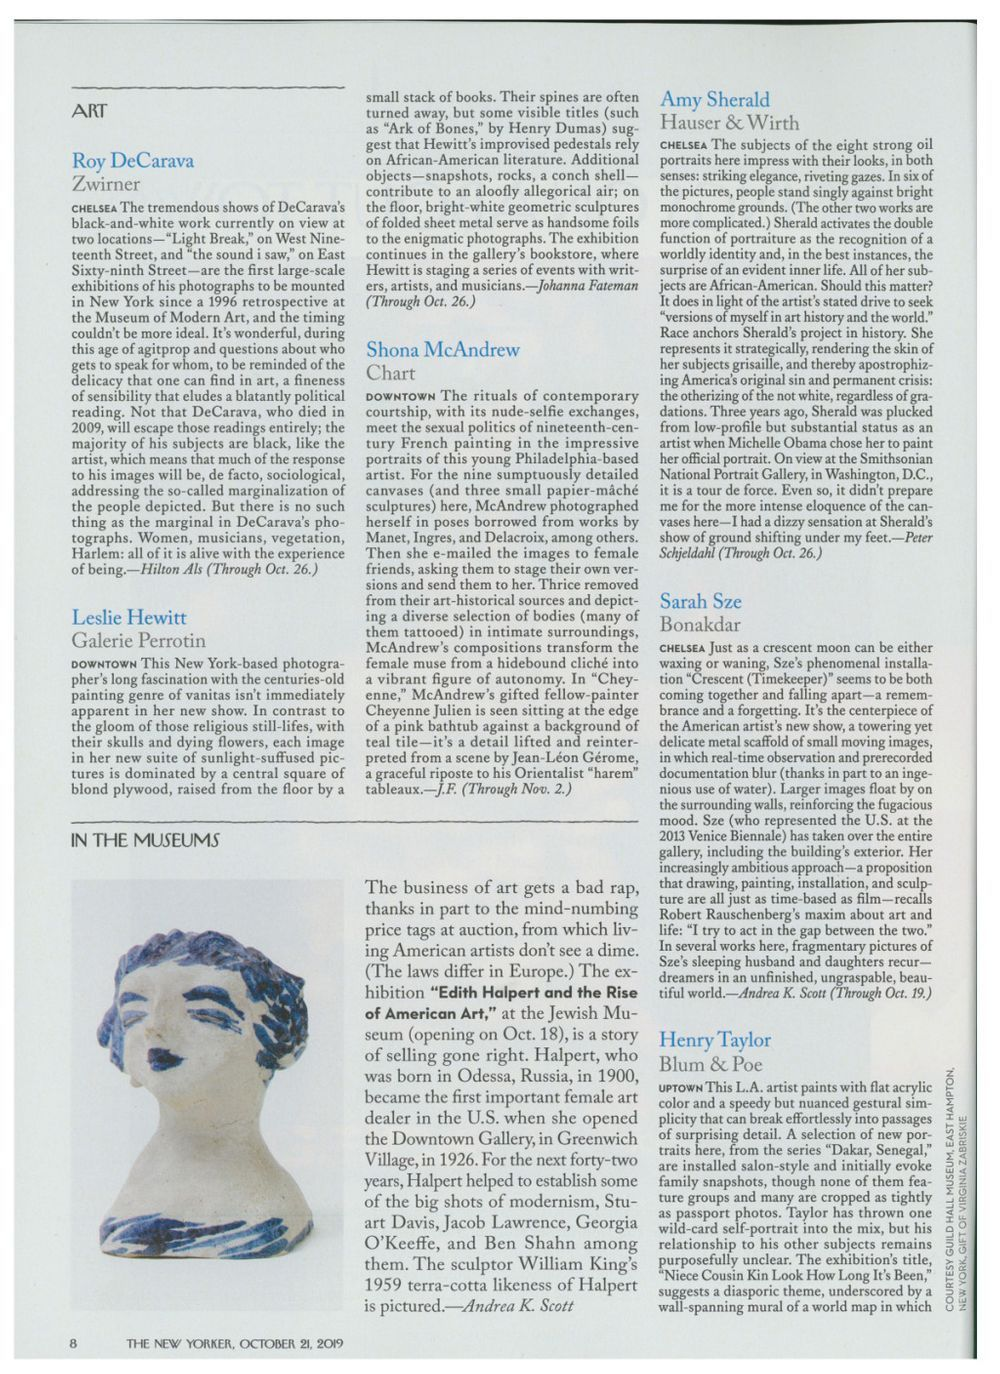 The New Yorker | Leslie HEWITT